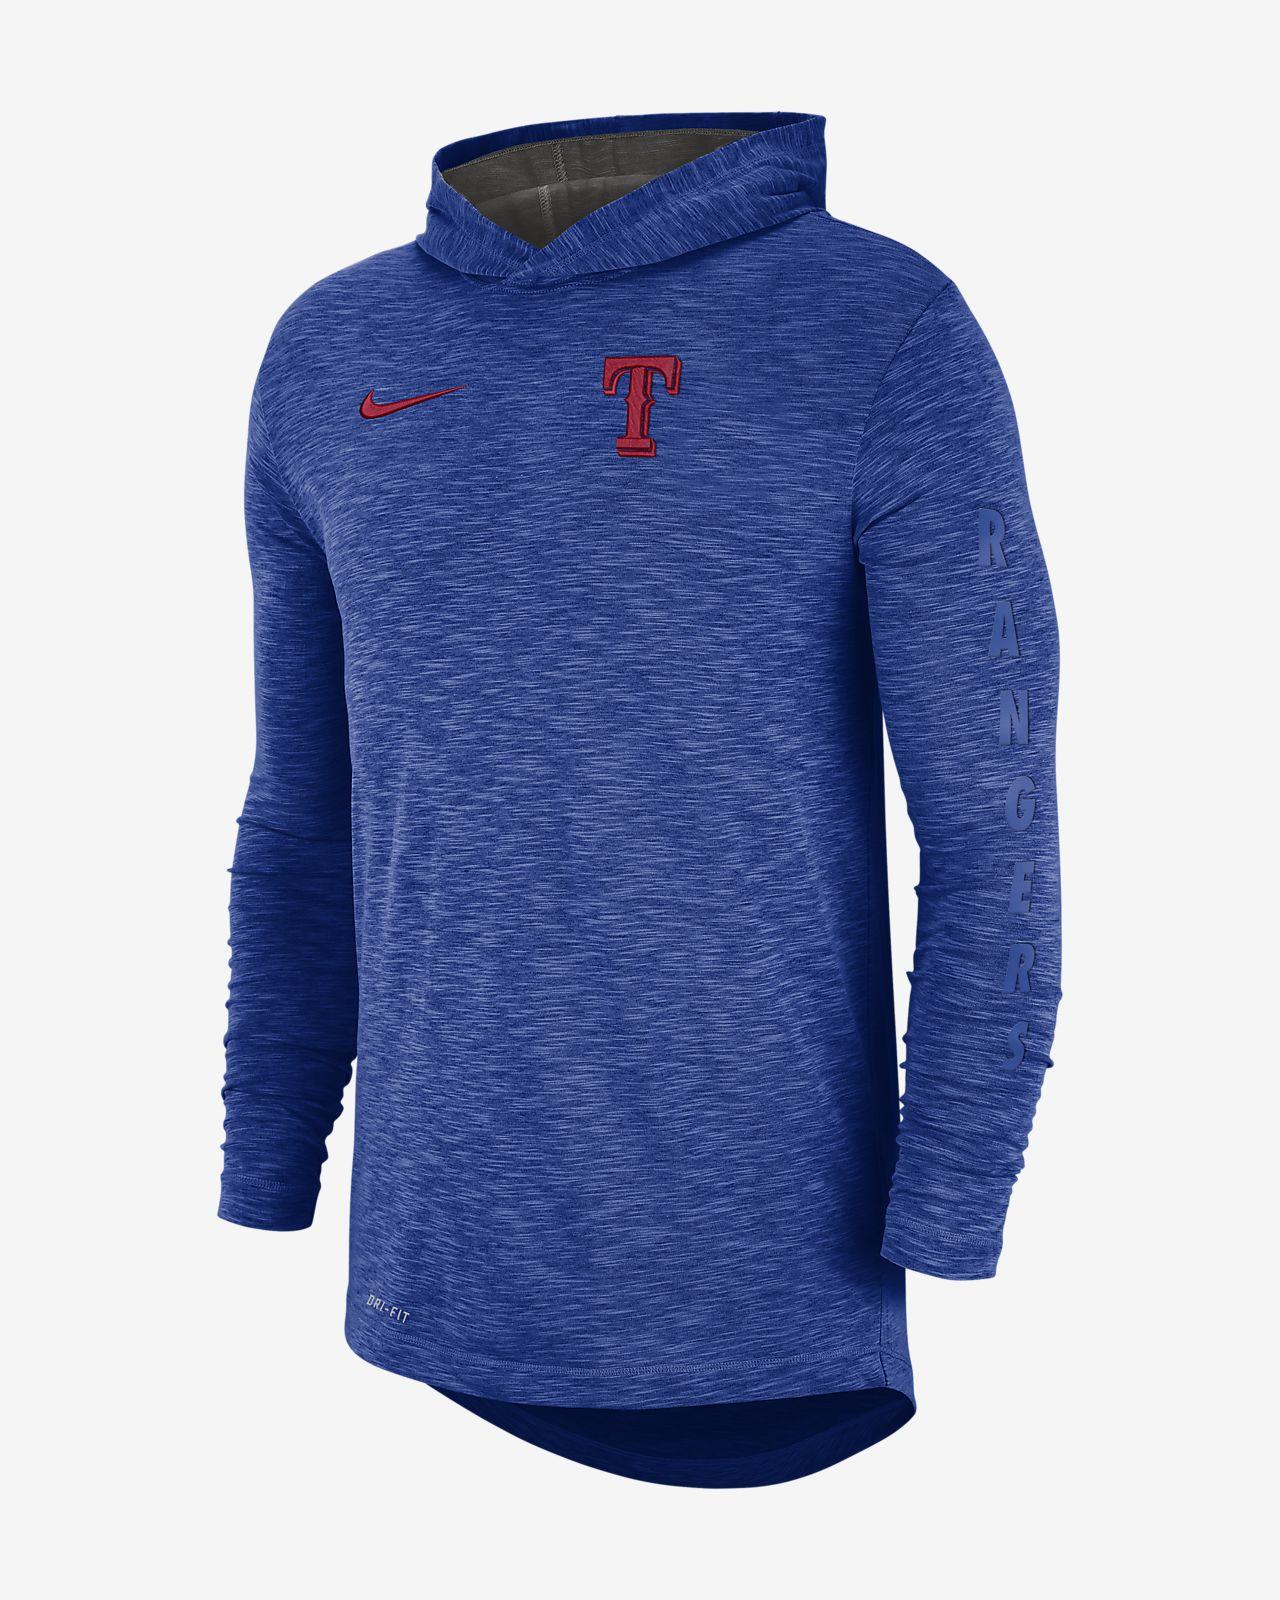 Nike Dri-FIT (MLB Rangers) Men's Hooded Top